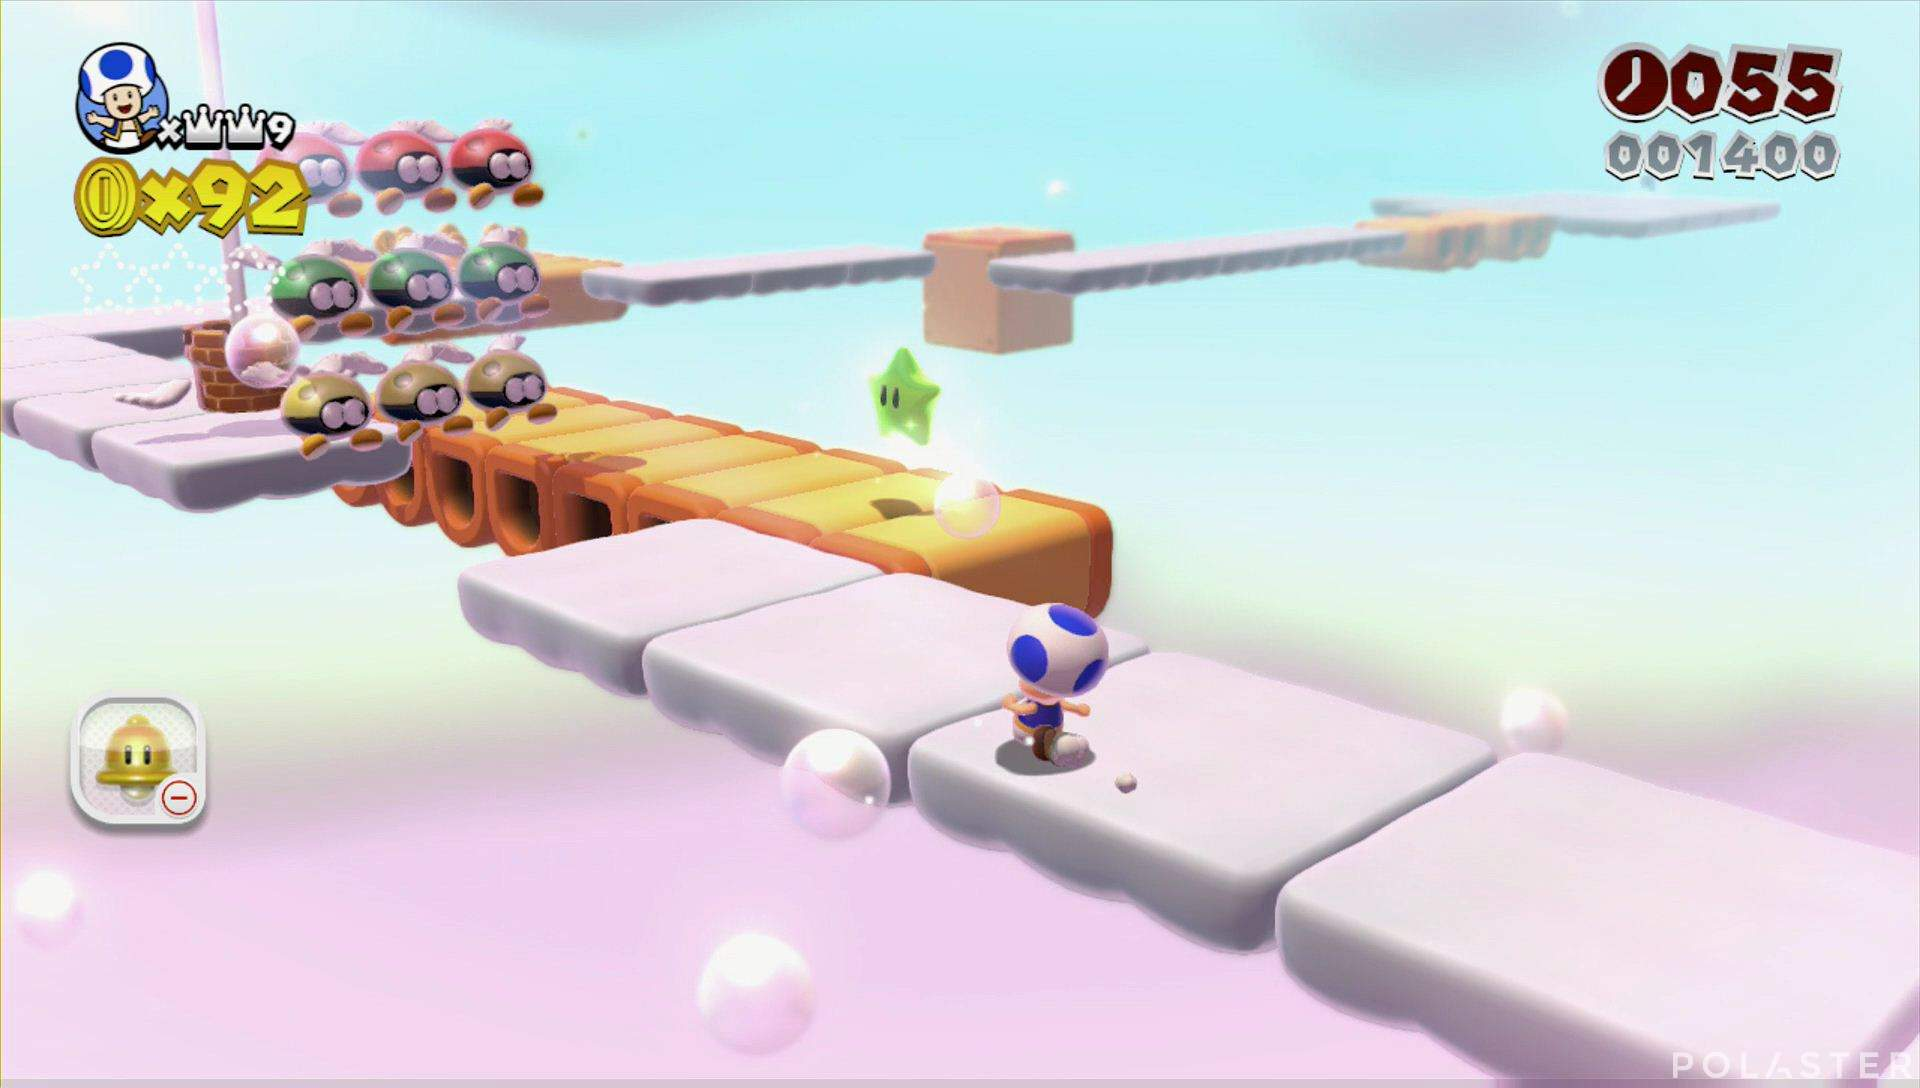 Super Mario 3D World Mundo Estrella-4 Estrella 1